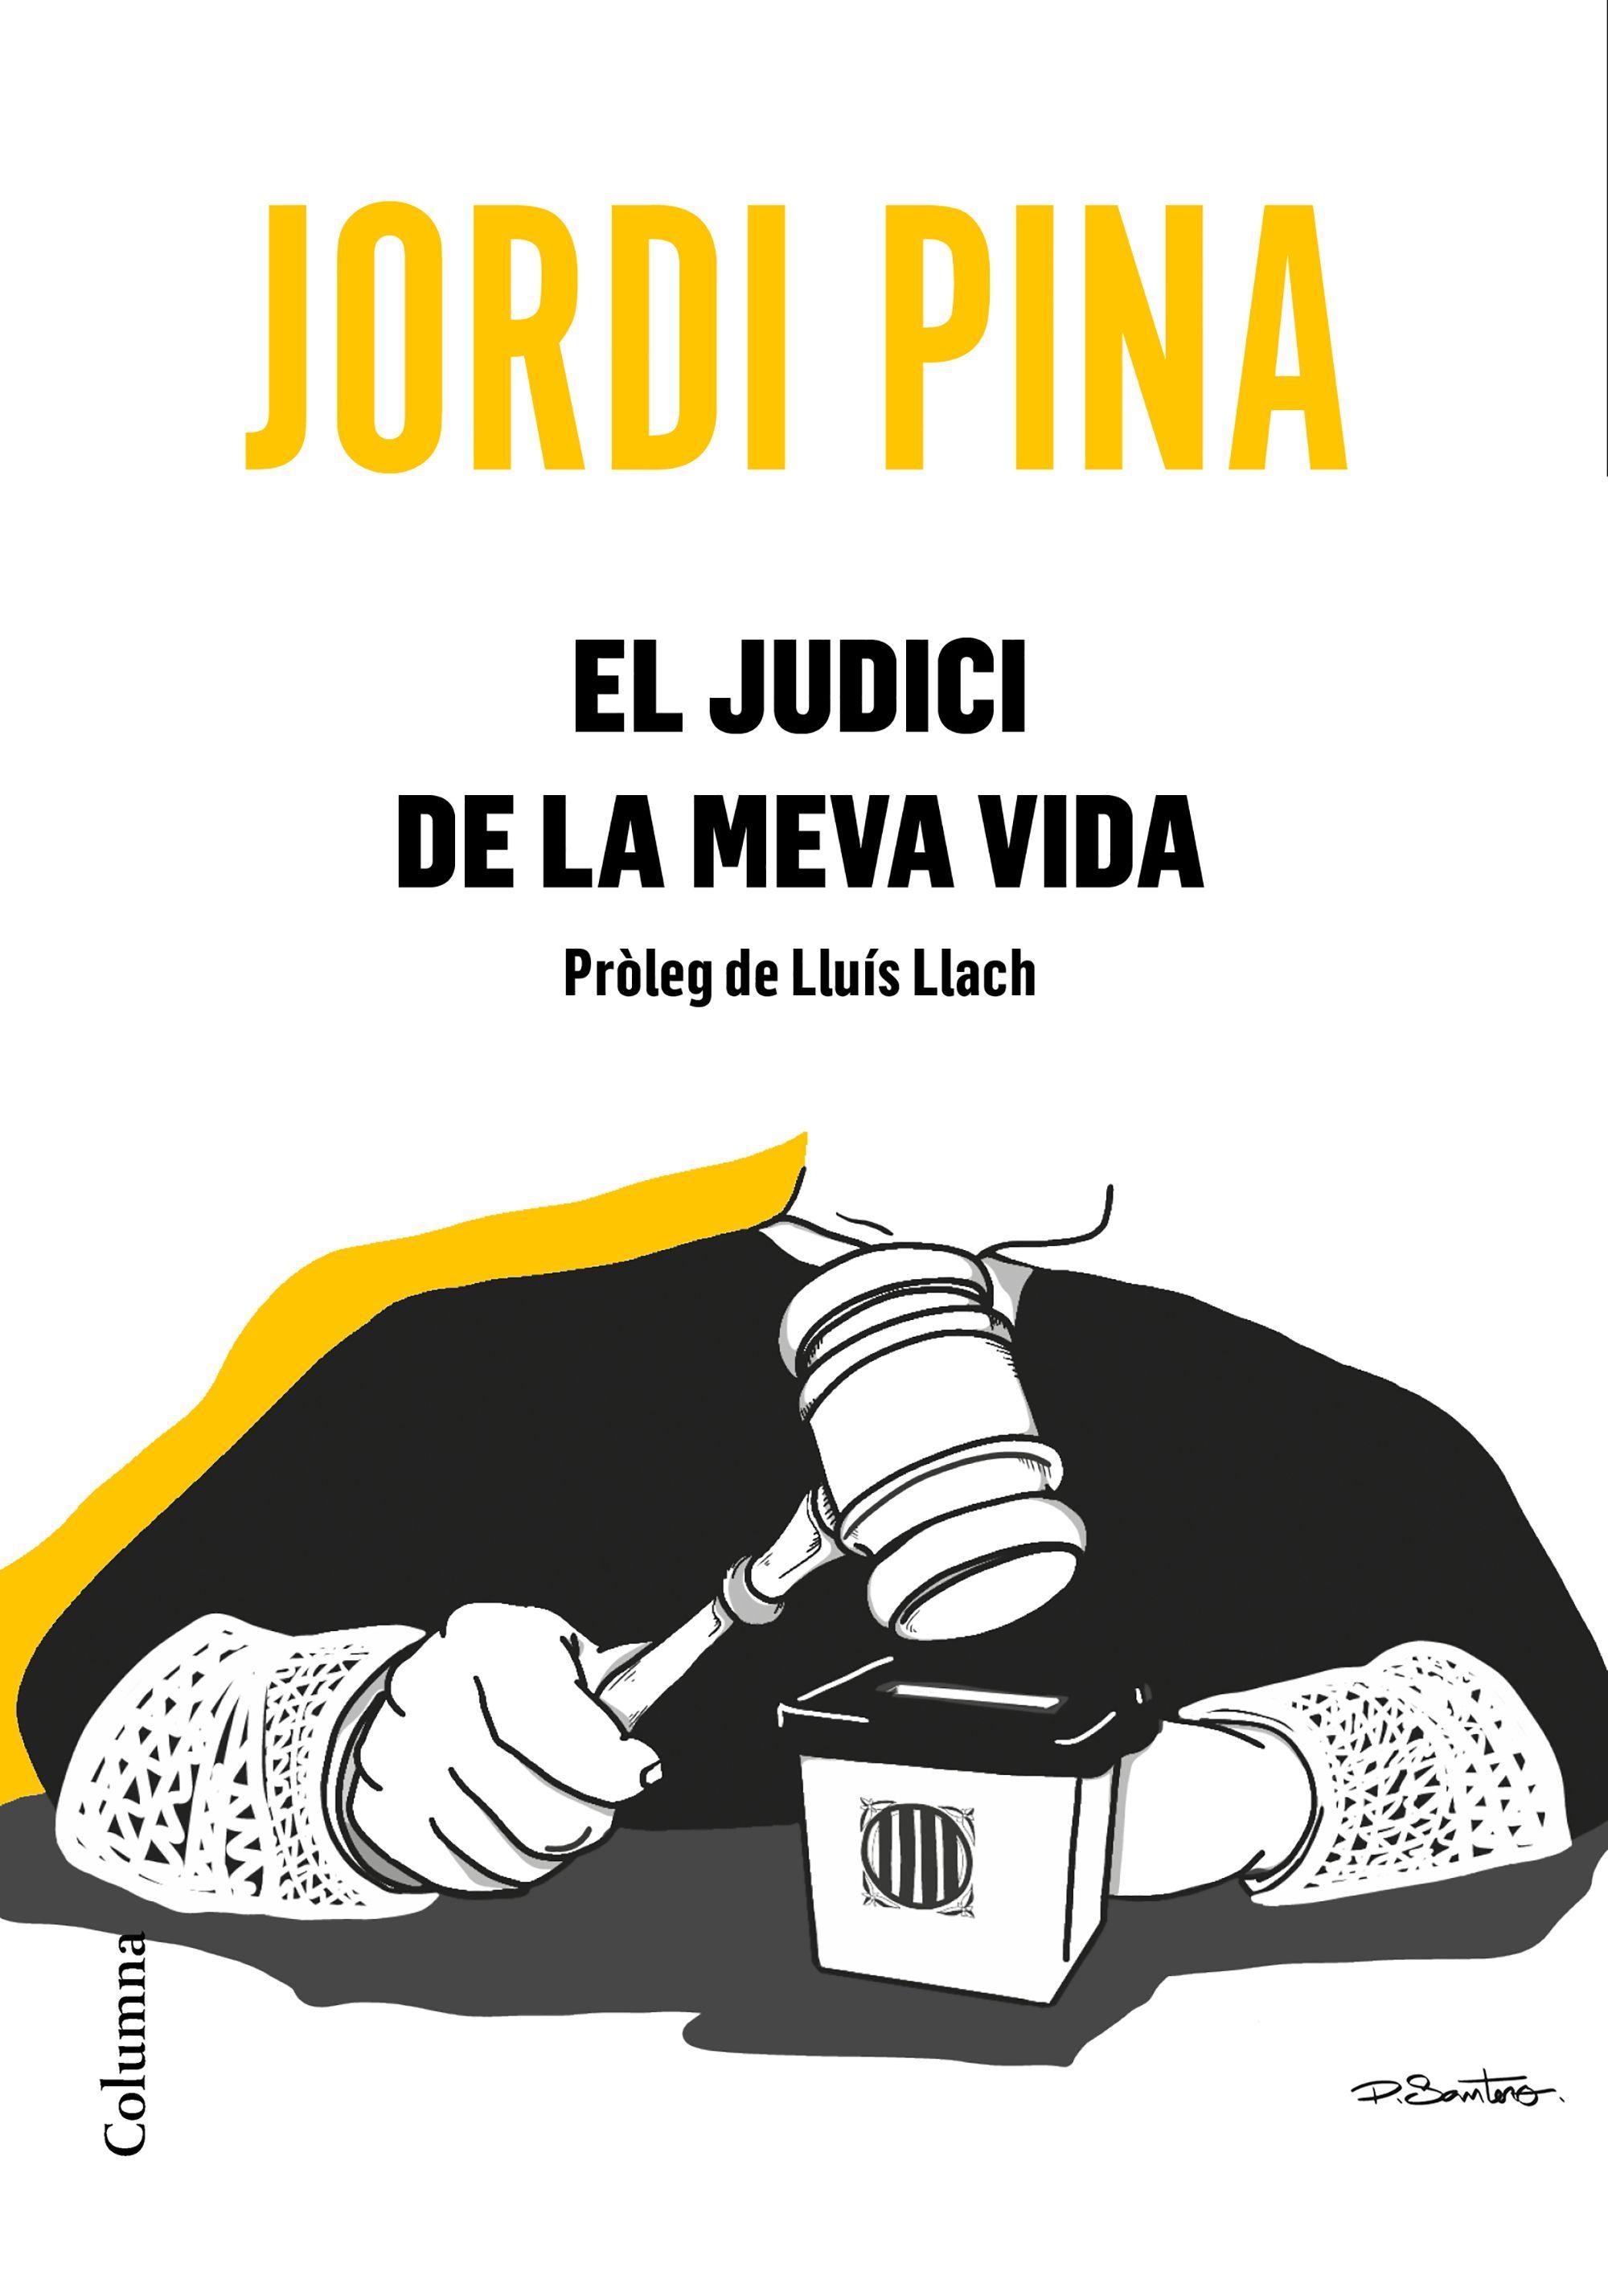 JUDICI DE LA MEVA VIDA